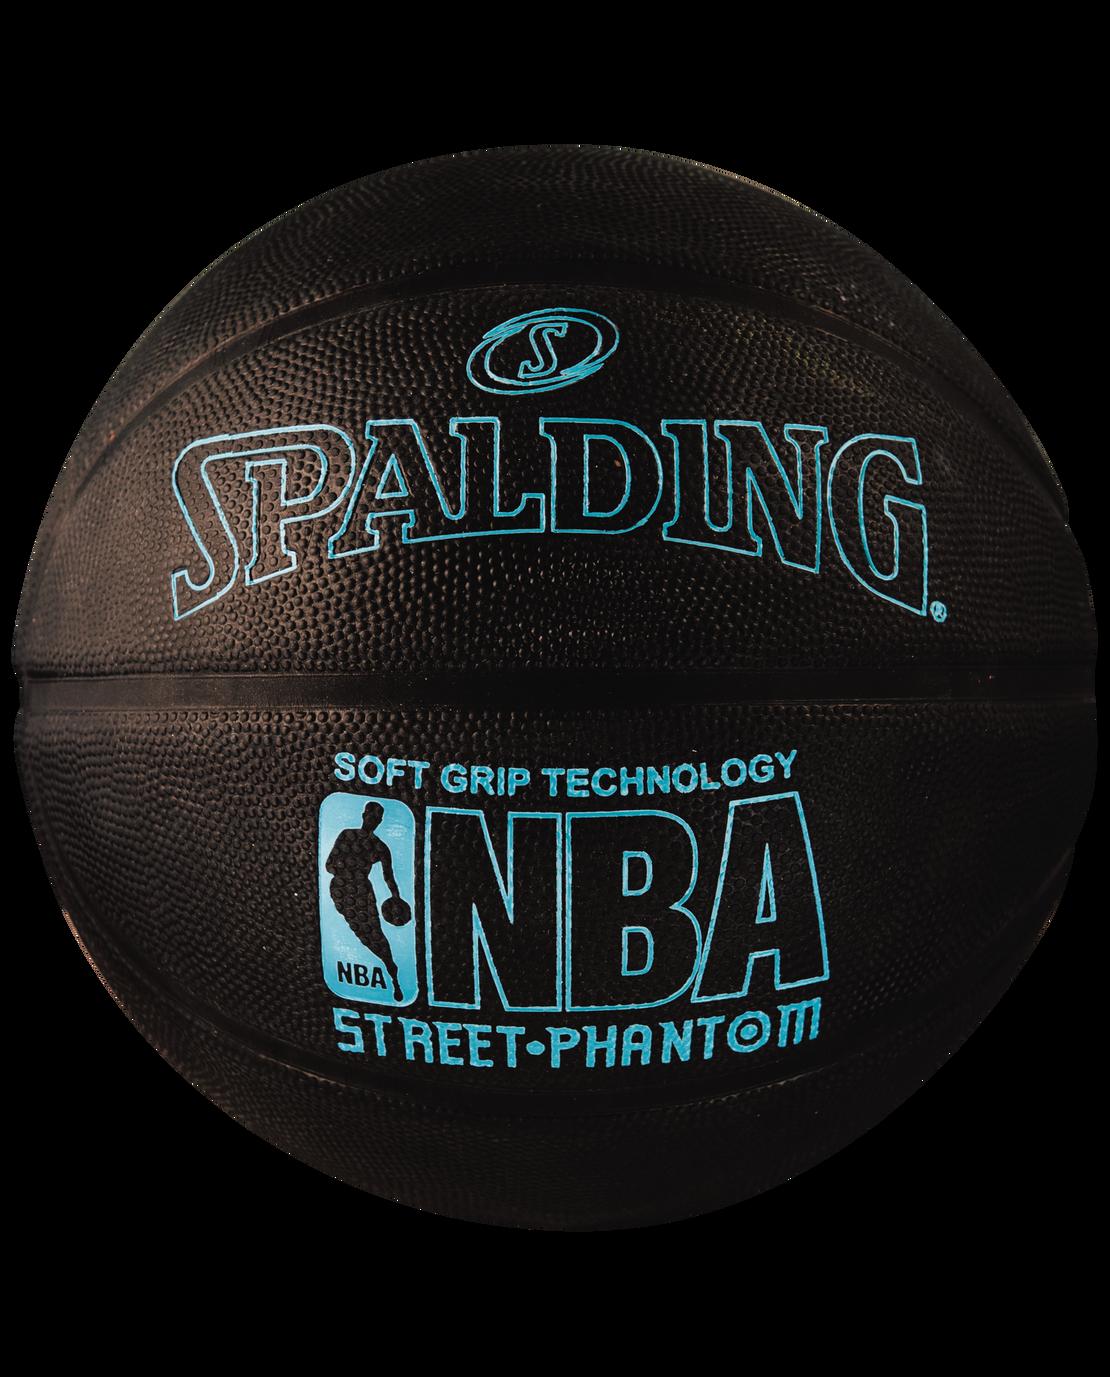 NBA STREET PHANTOM BASKETBALL